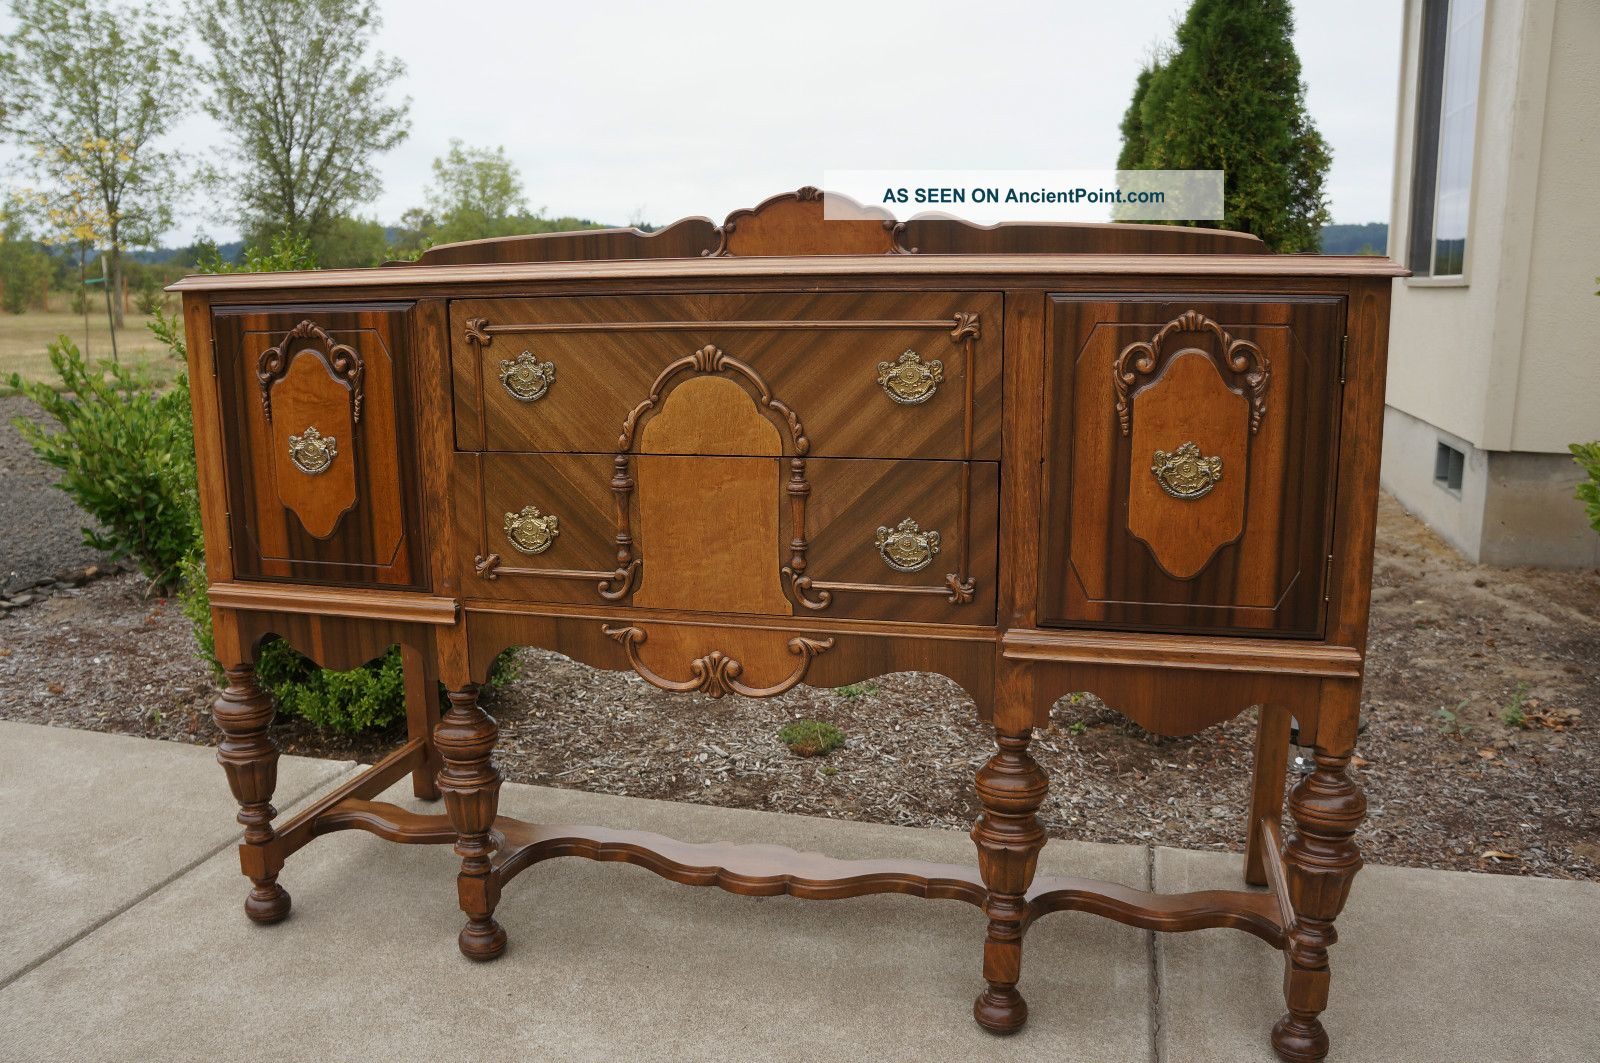 78581 Magnificent antique buffet vintage server sideboard buffet ...